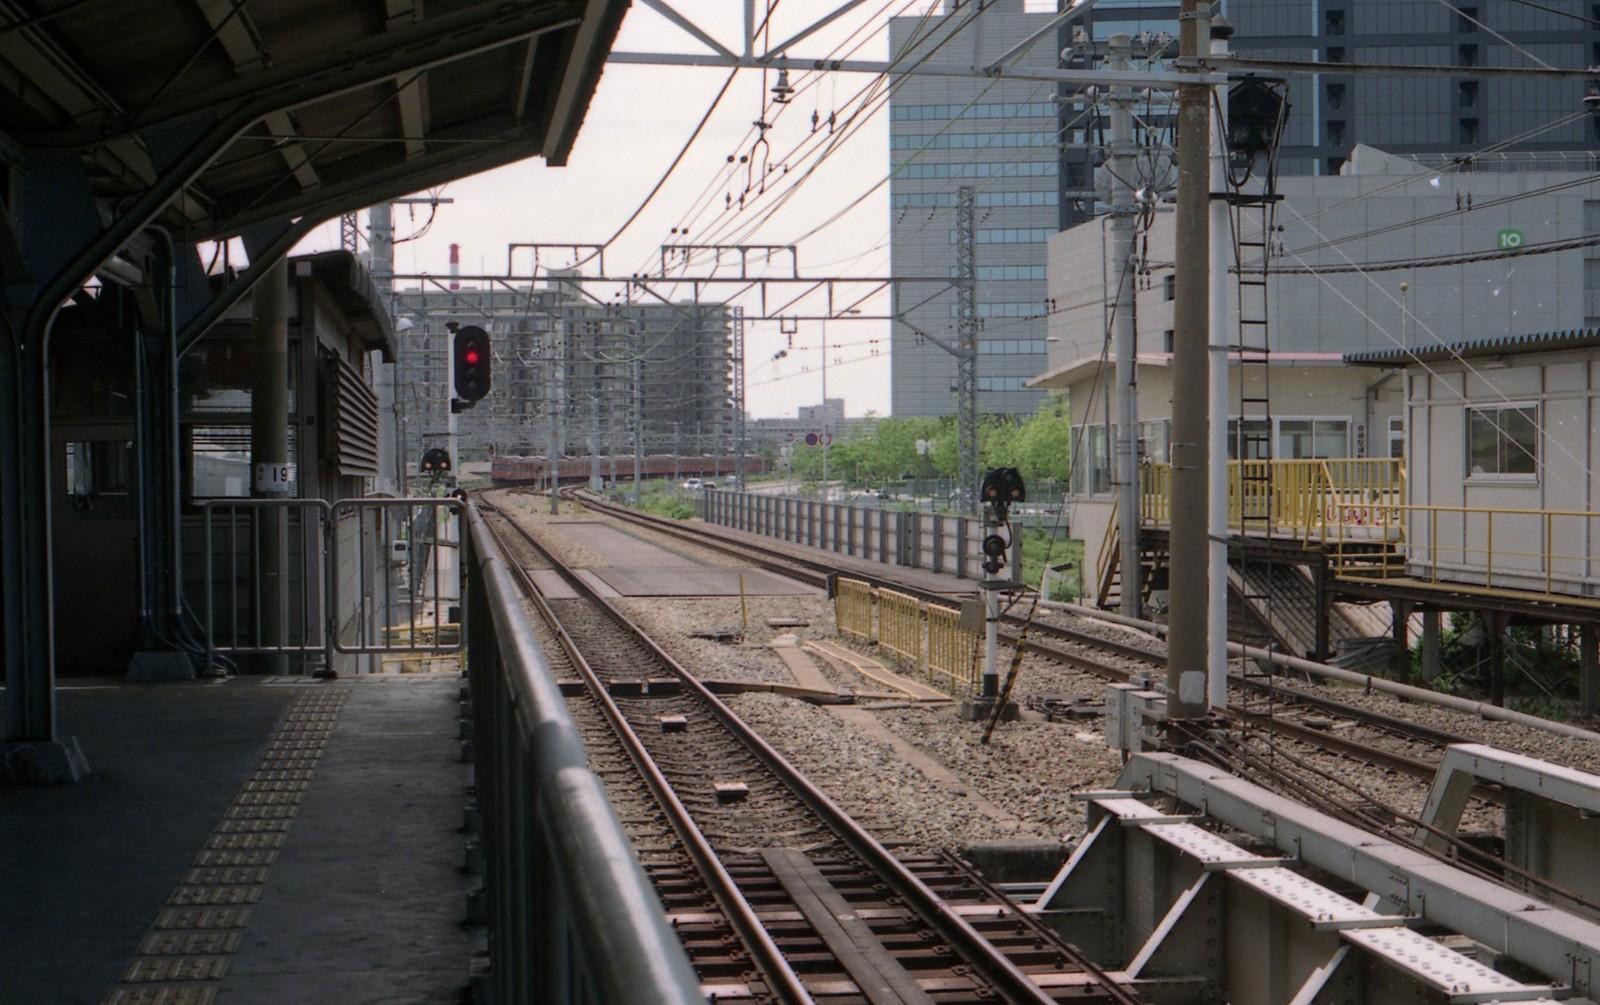 19920510a02